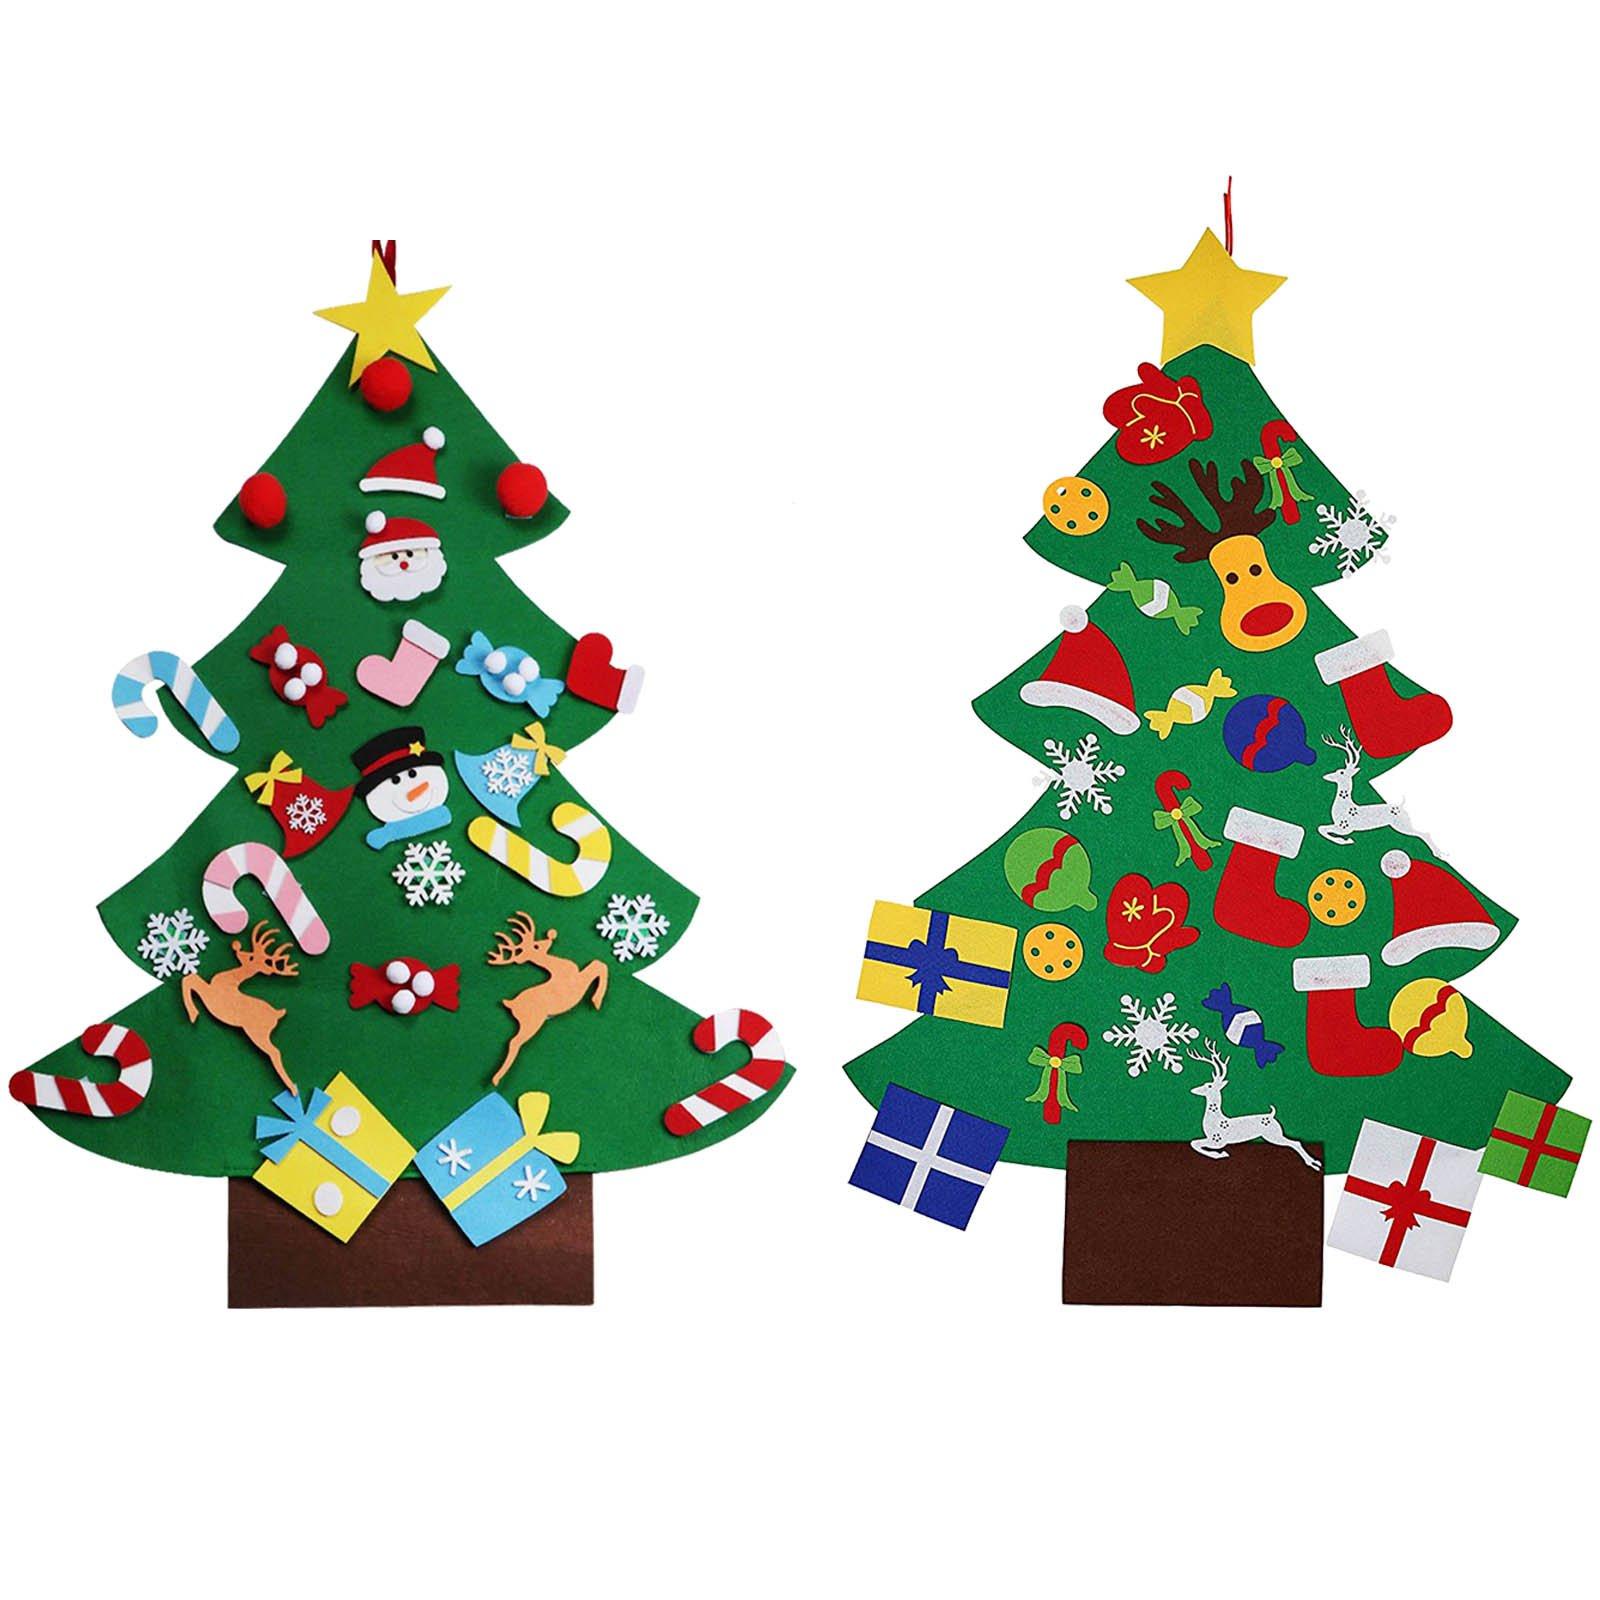 Felt Christmas Decorations Uk.Vlovelife 3ft Felt Christmas Tree 26pcs Detachable Hanging Ornaments Xmas Party Home Decor Kids Diy Xmas Gift Xmas Uk